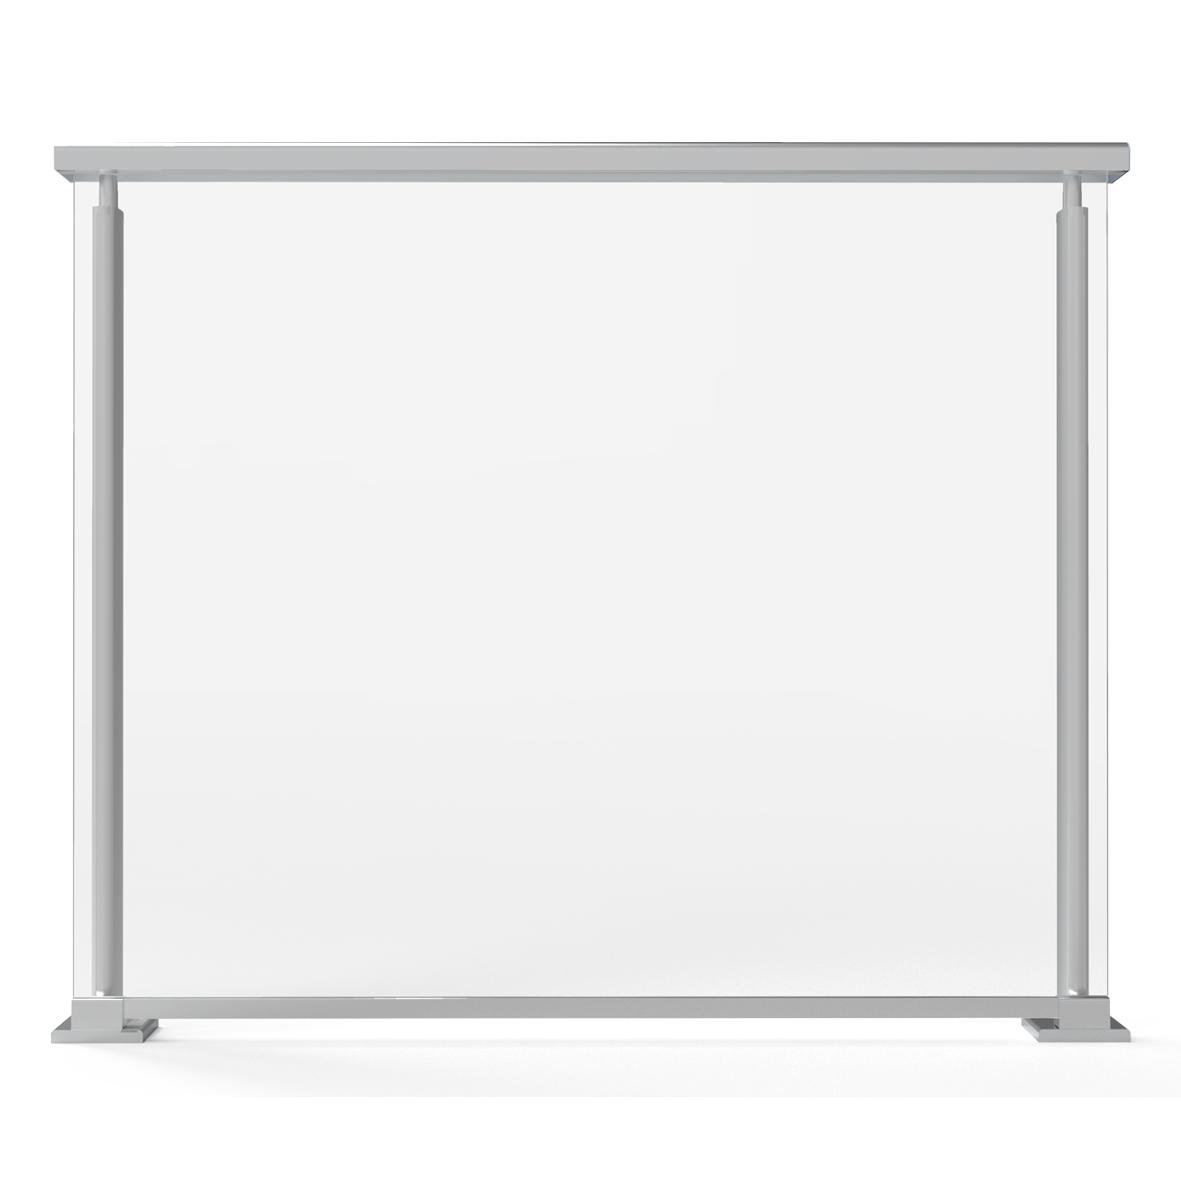 https://www.allpaint.it/wp-content/uploads/2021/07/ringhiere-alluminio-classic-allpaint.jpg